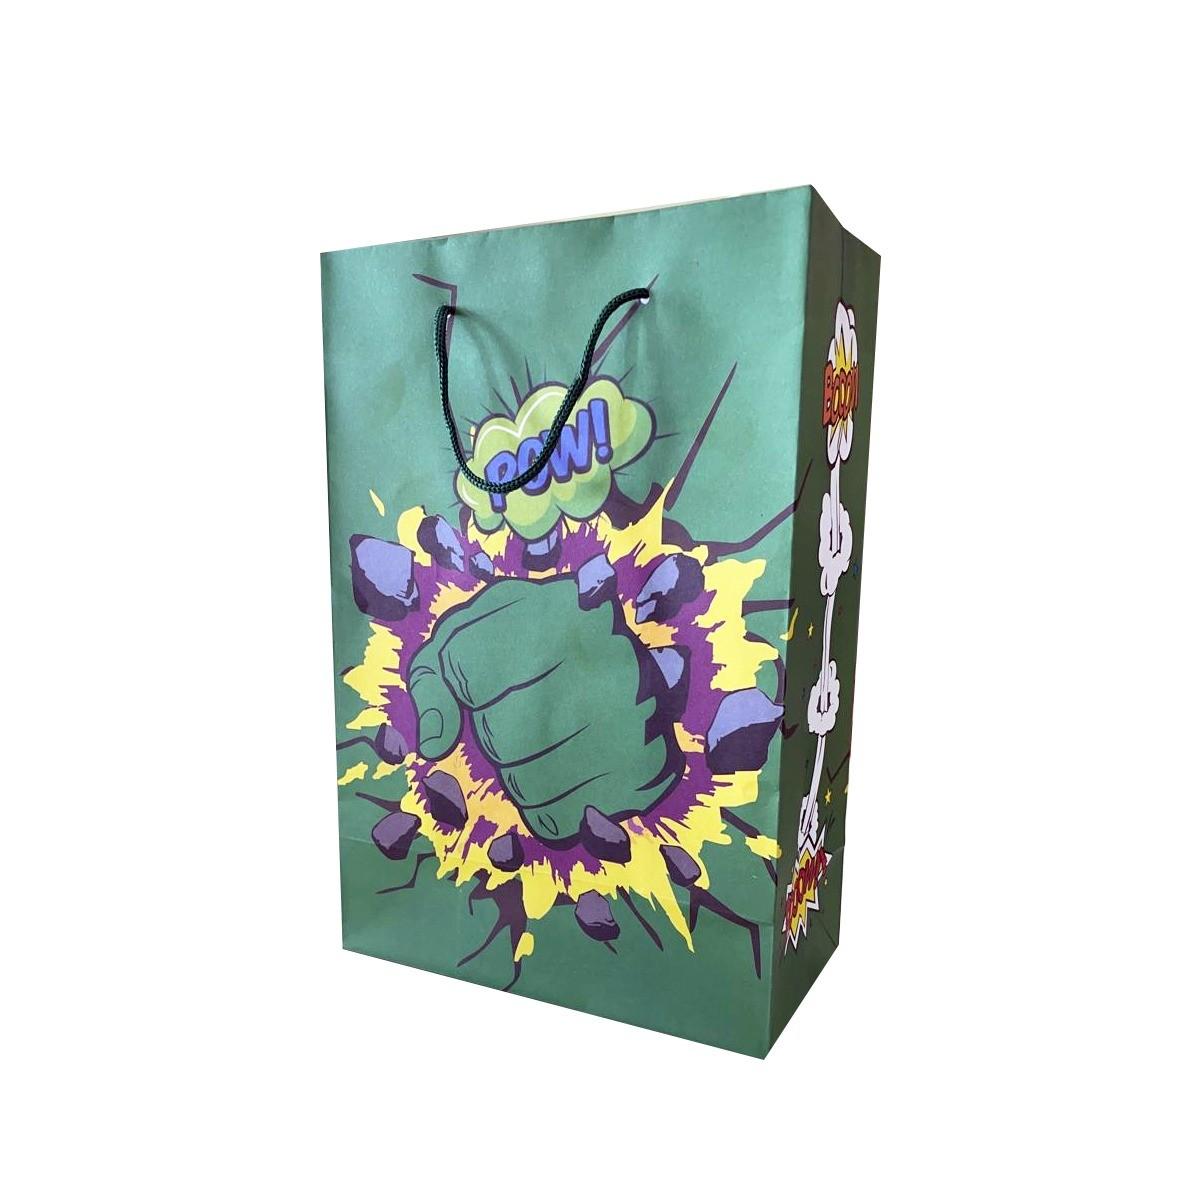 Bolsa de papel hulk 10 unidades